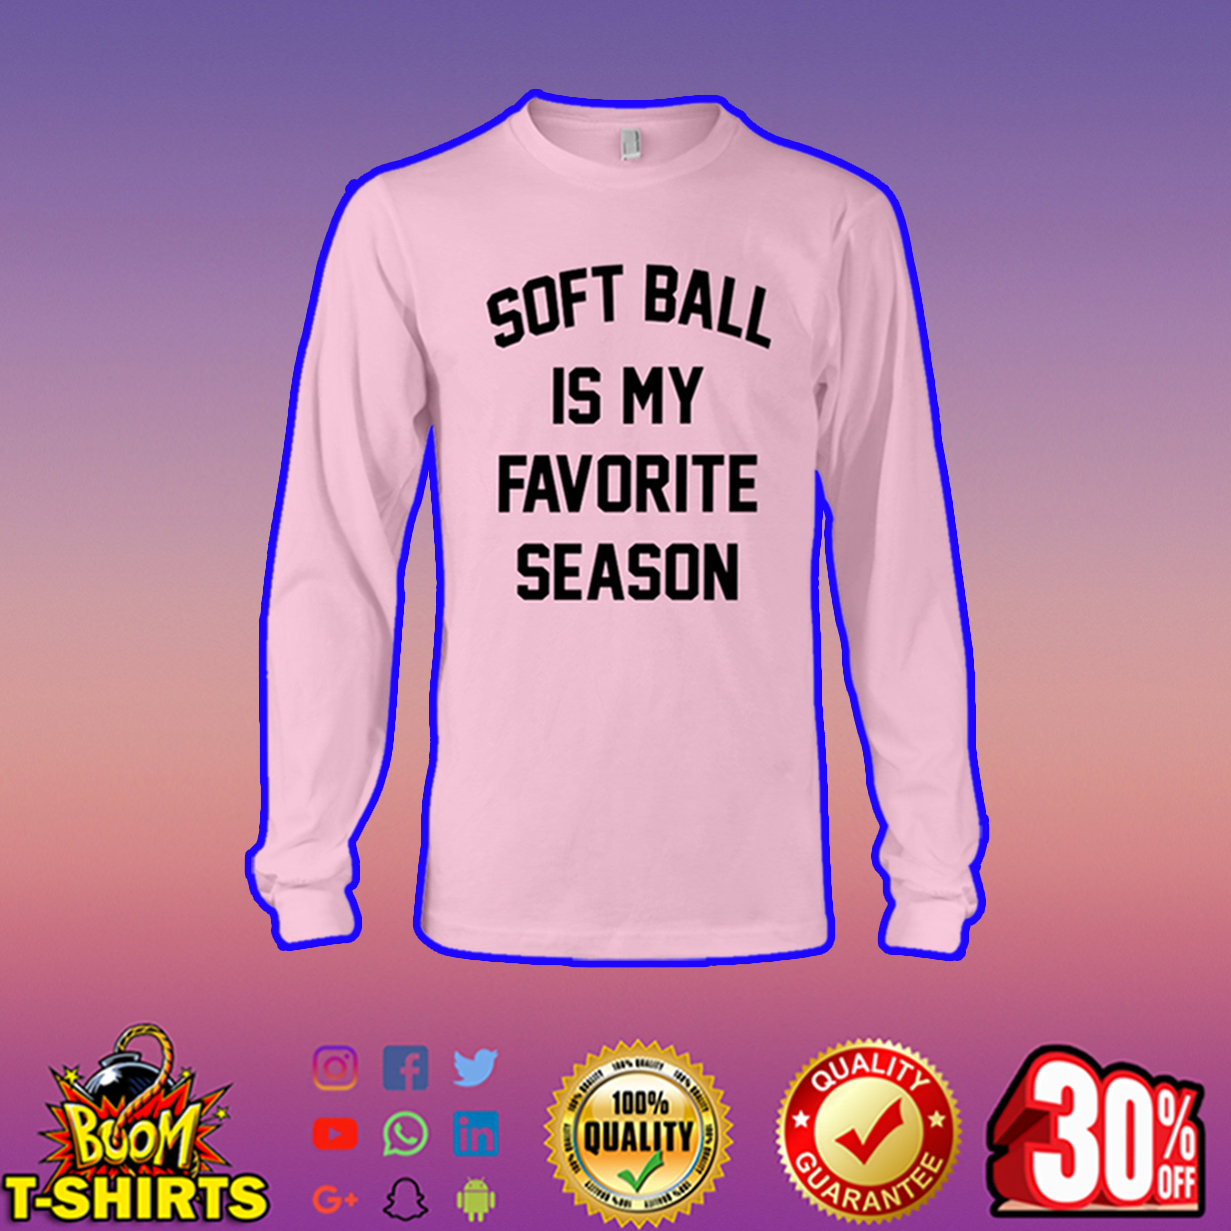 Soft Ball is my Favorite Season long sleeve tee